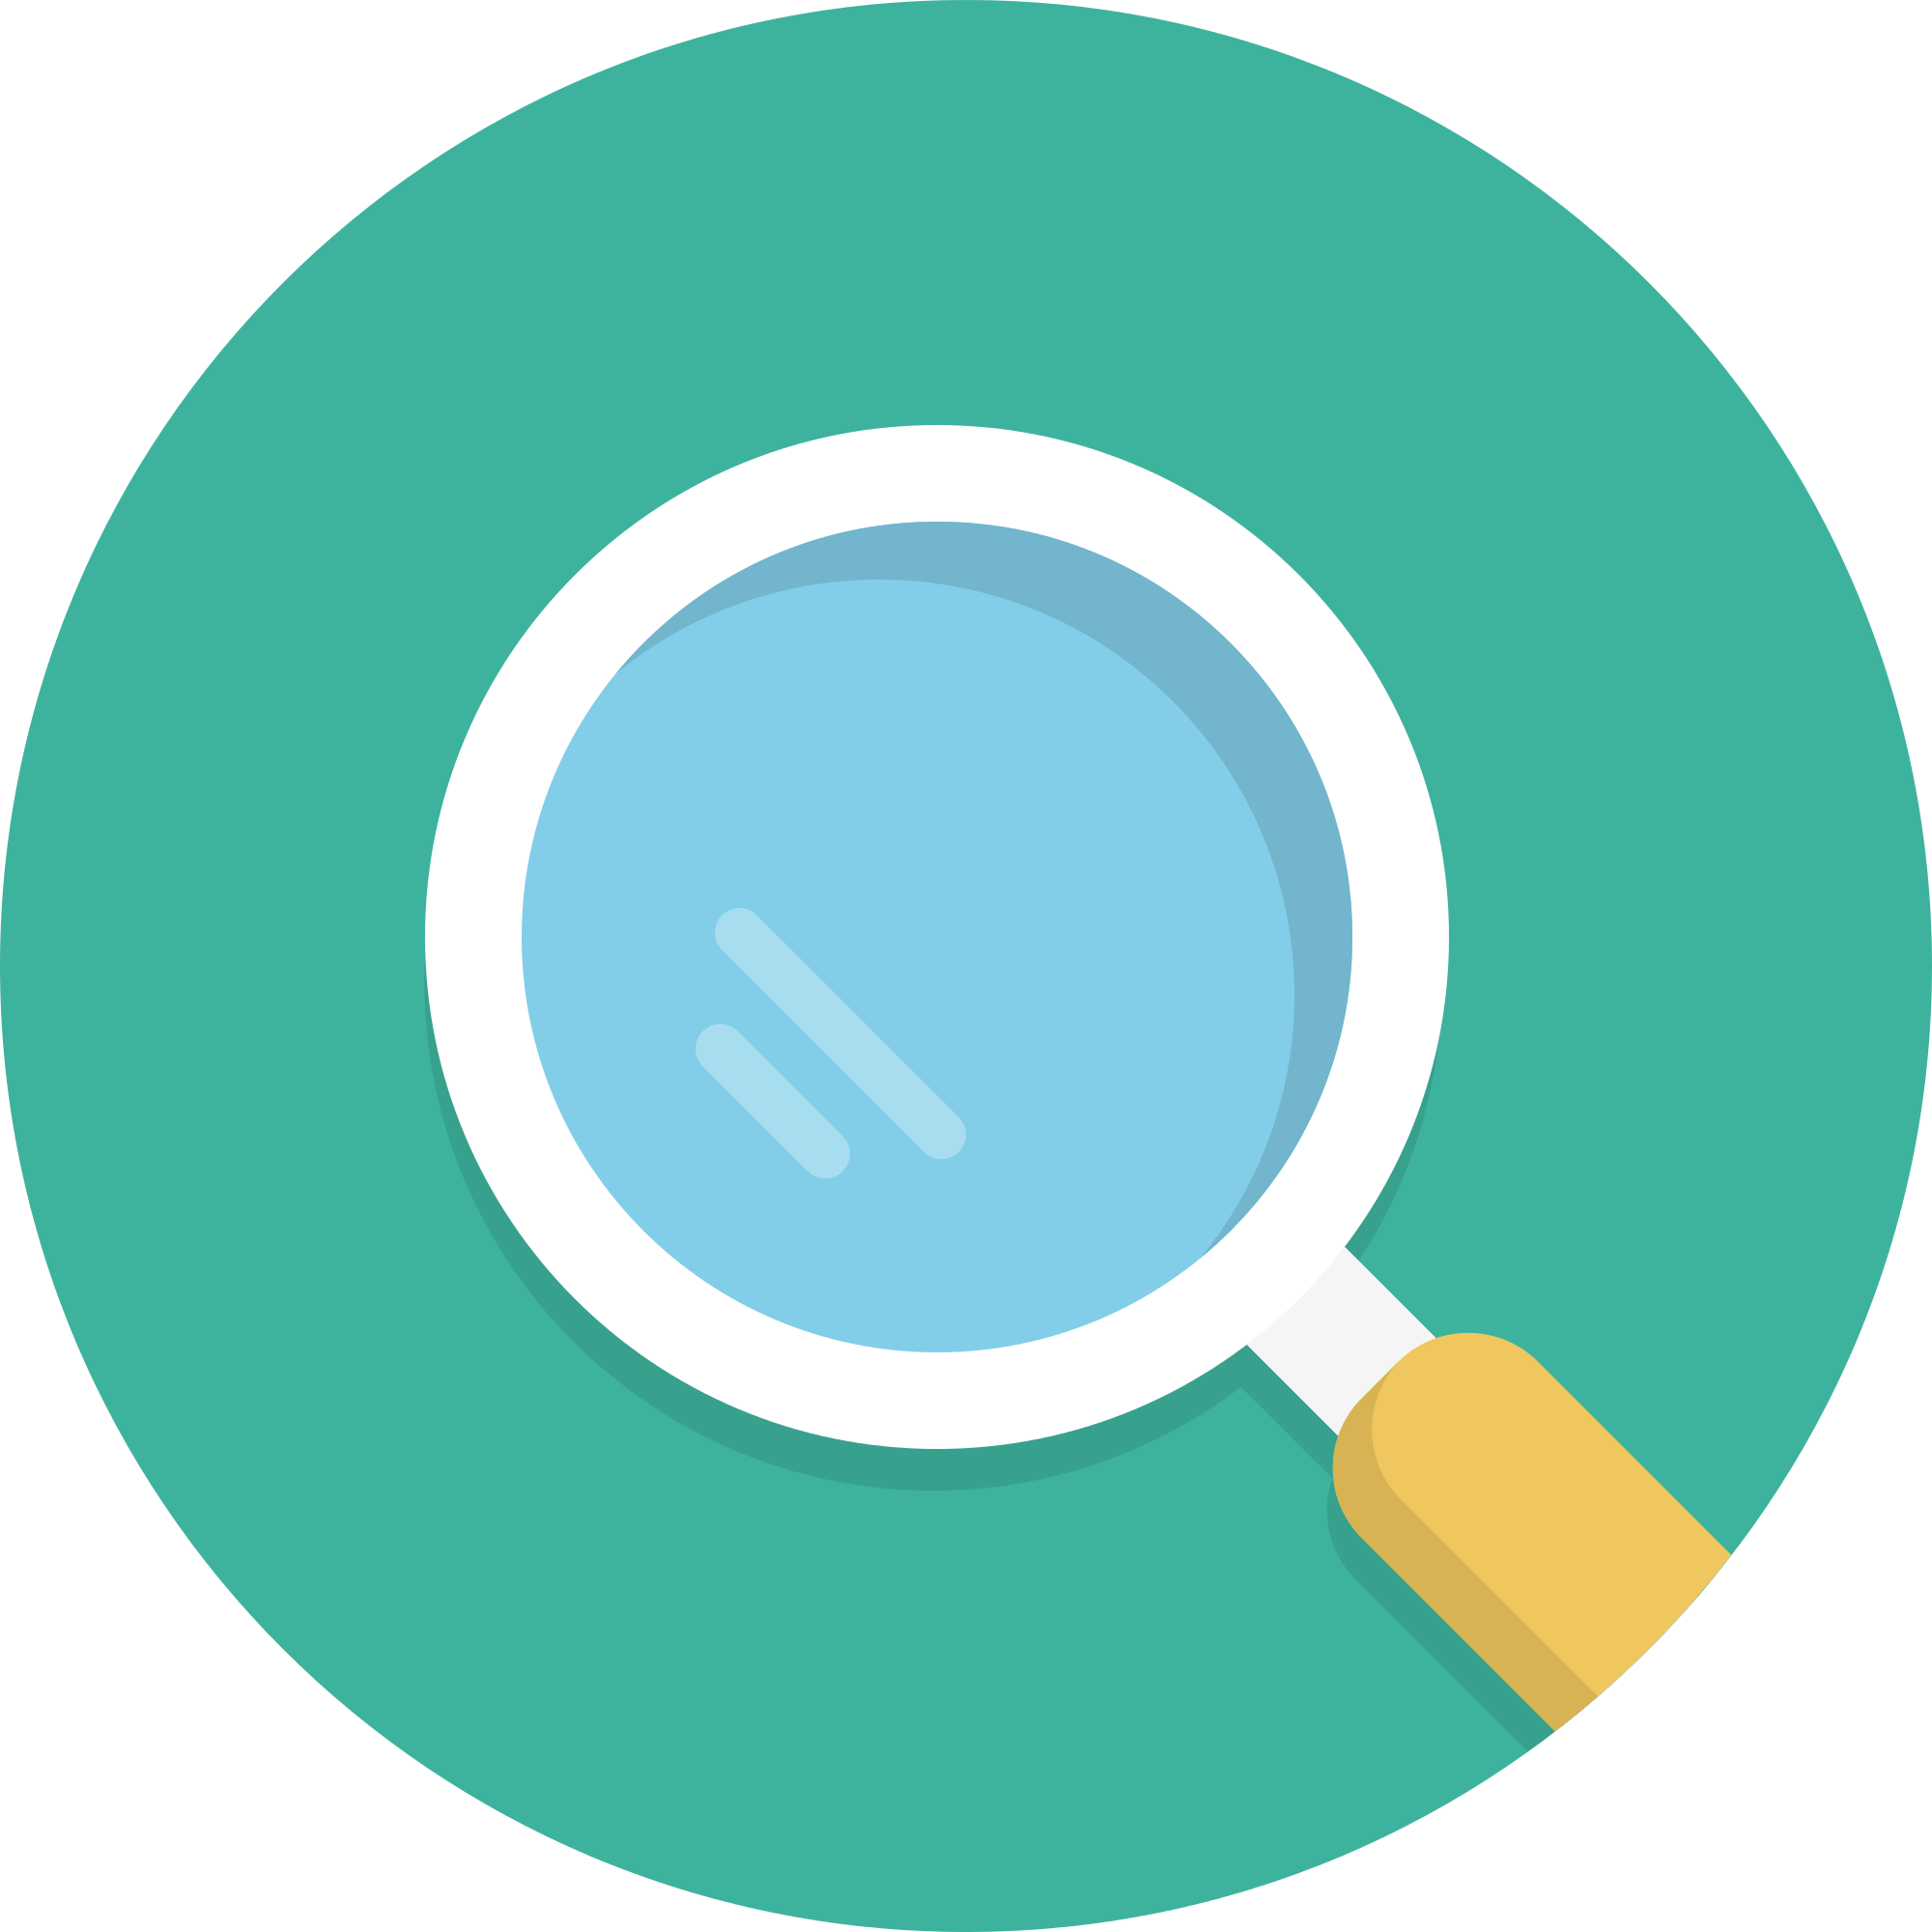 Search Engine Optimization (SEO) -